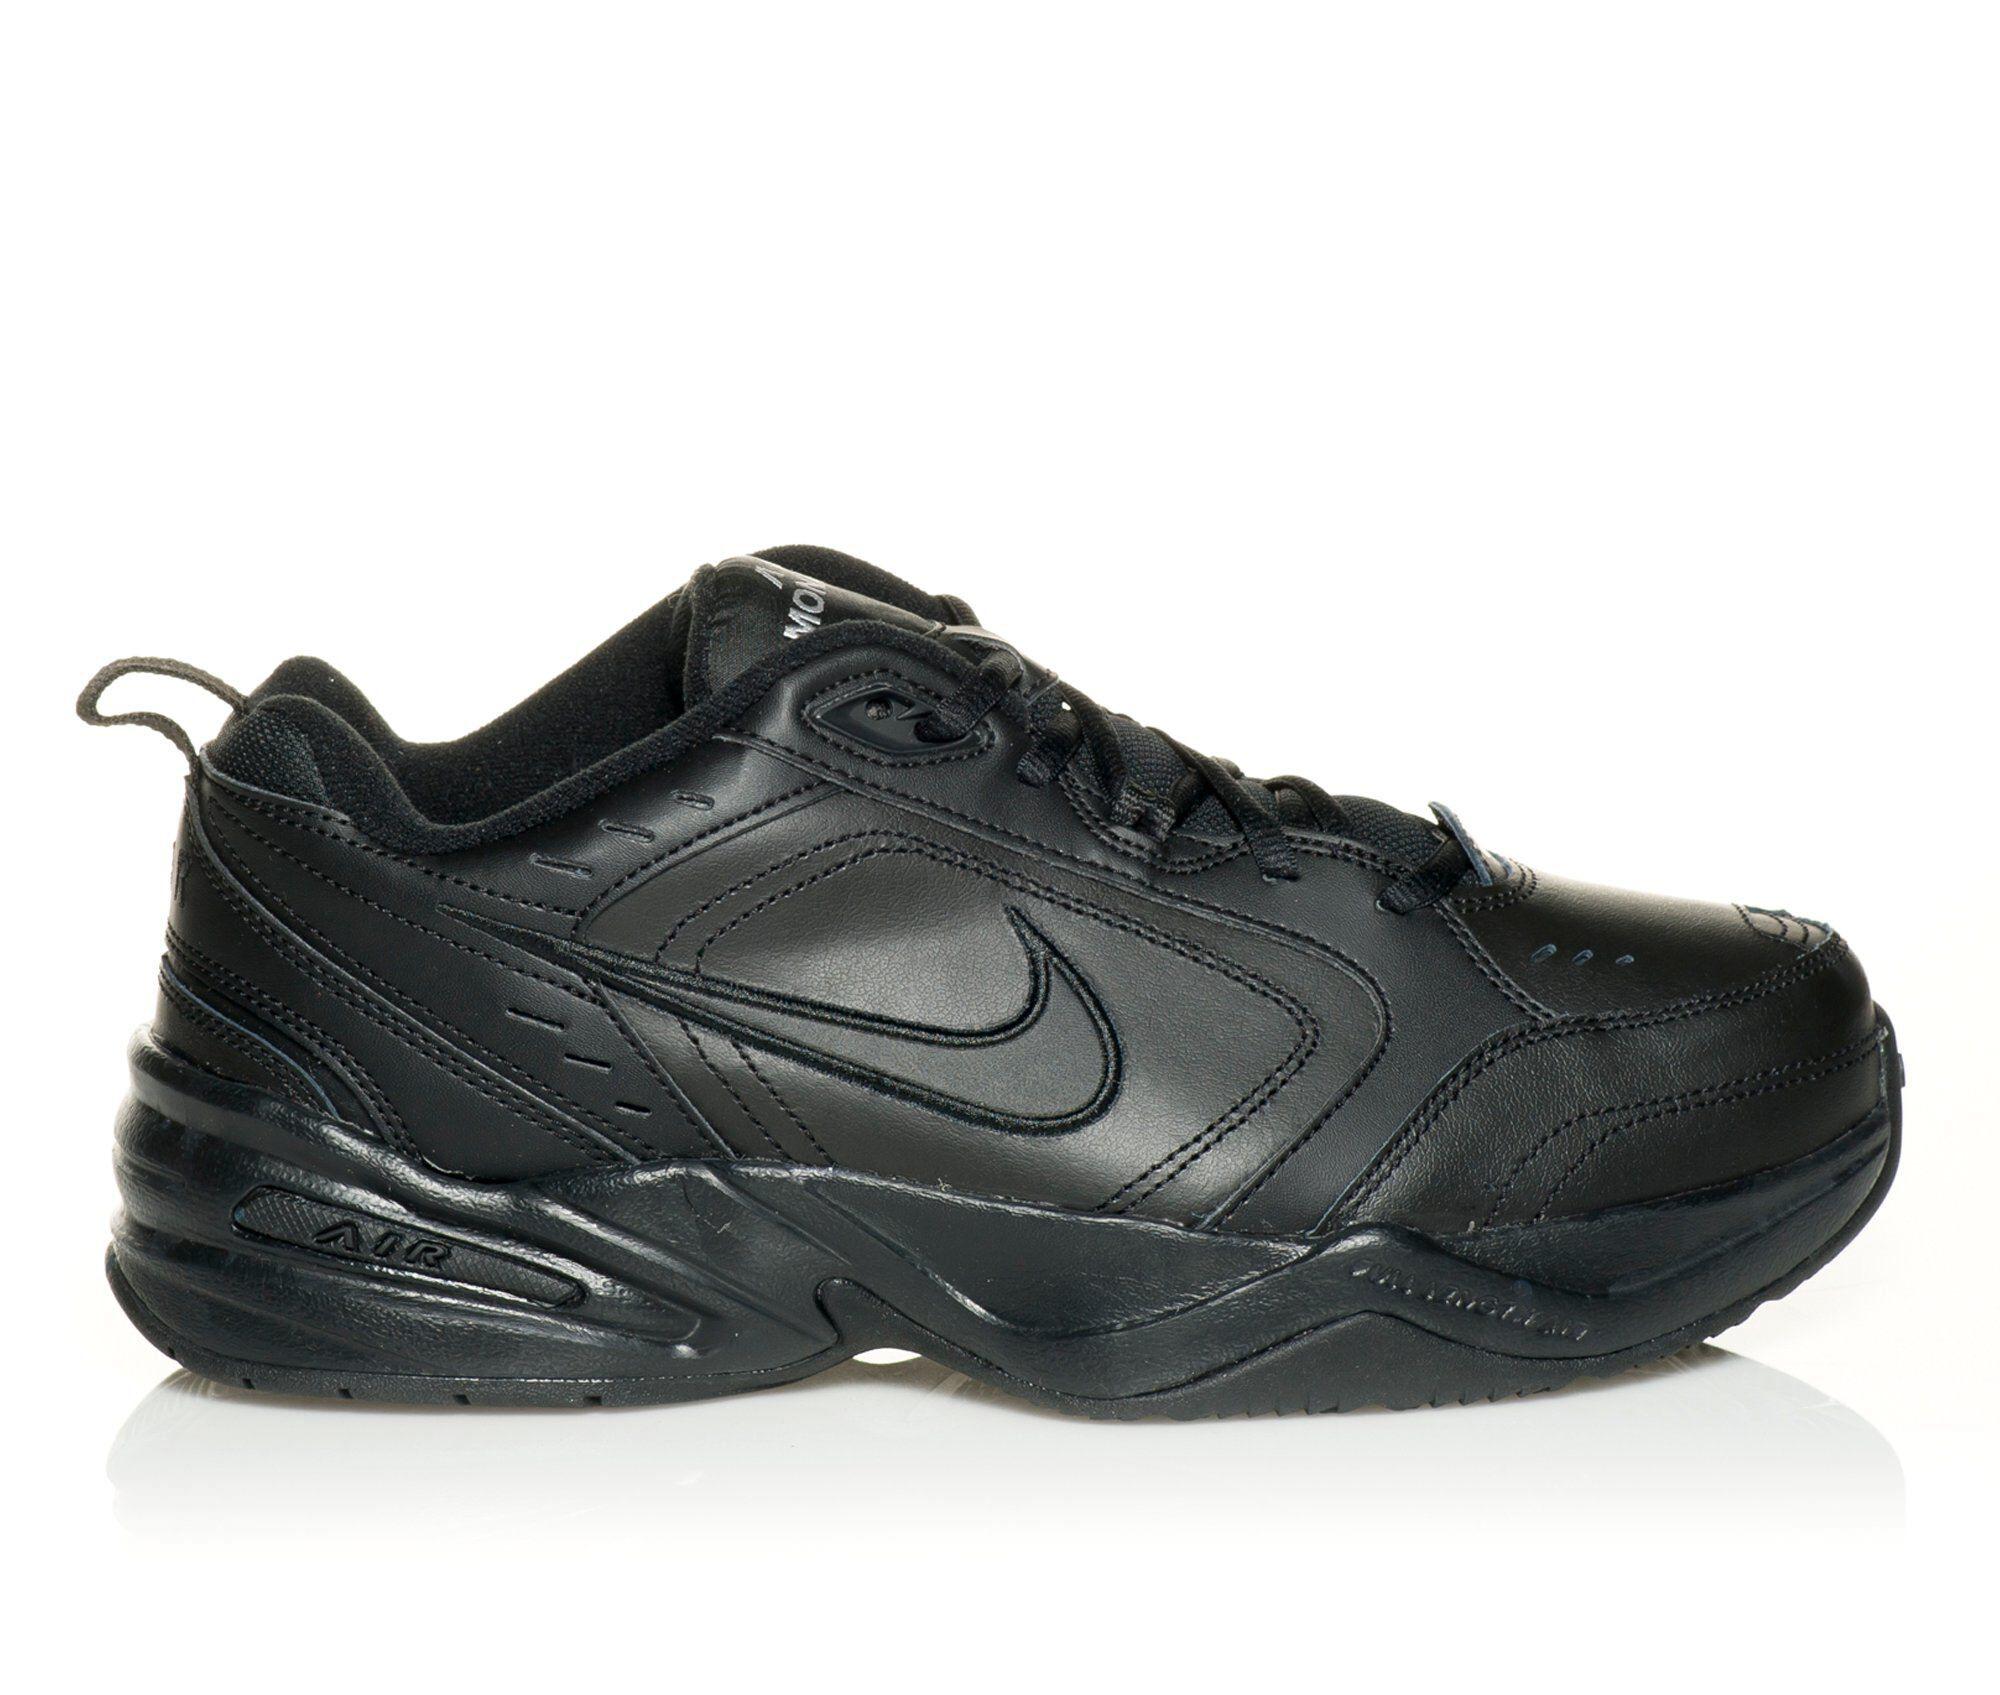 Men's Nike Air Monarch IV Training Shoes Black